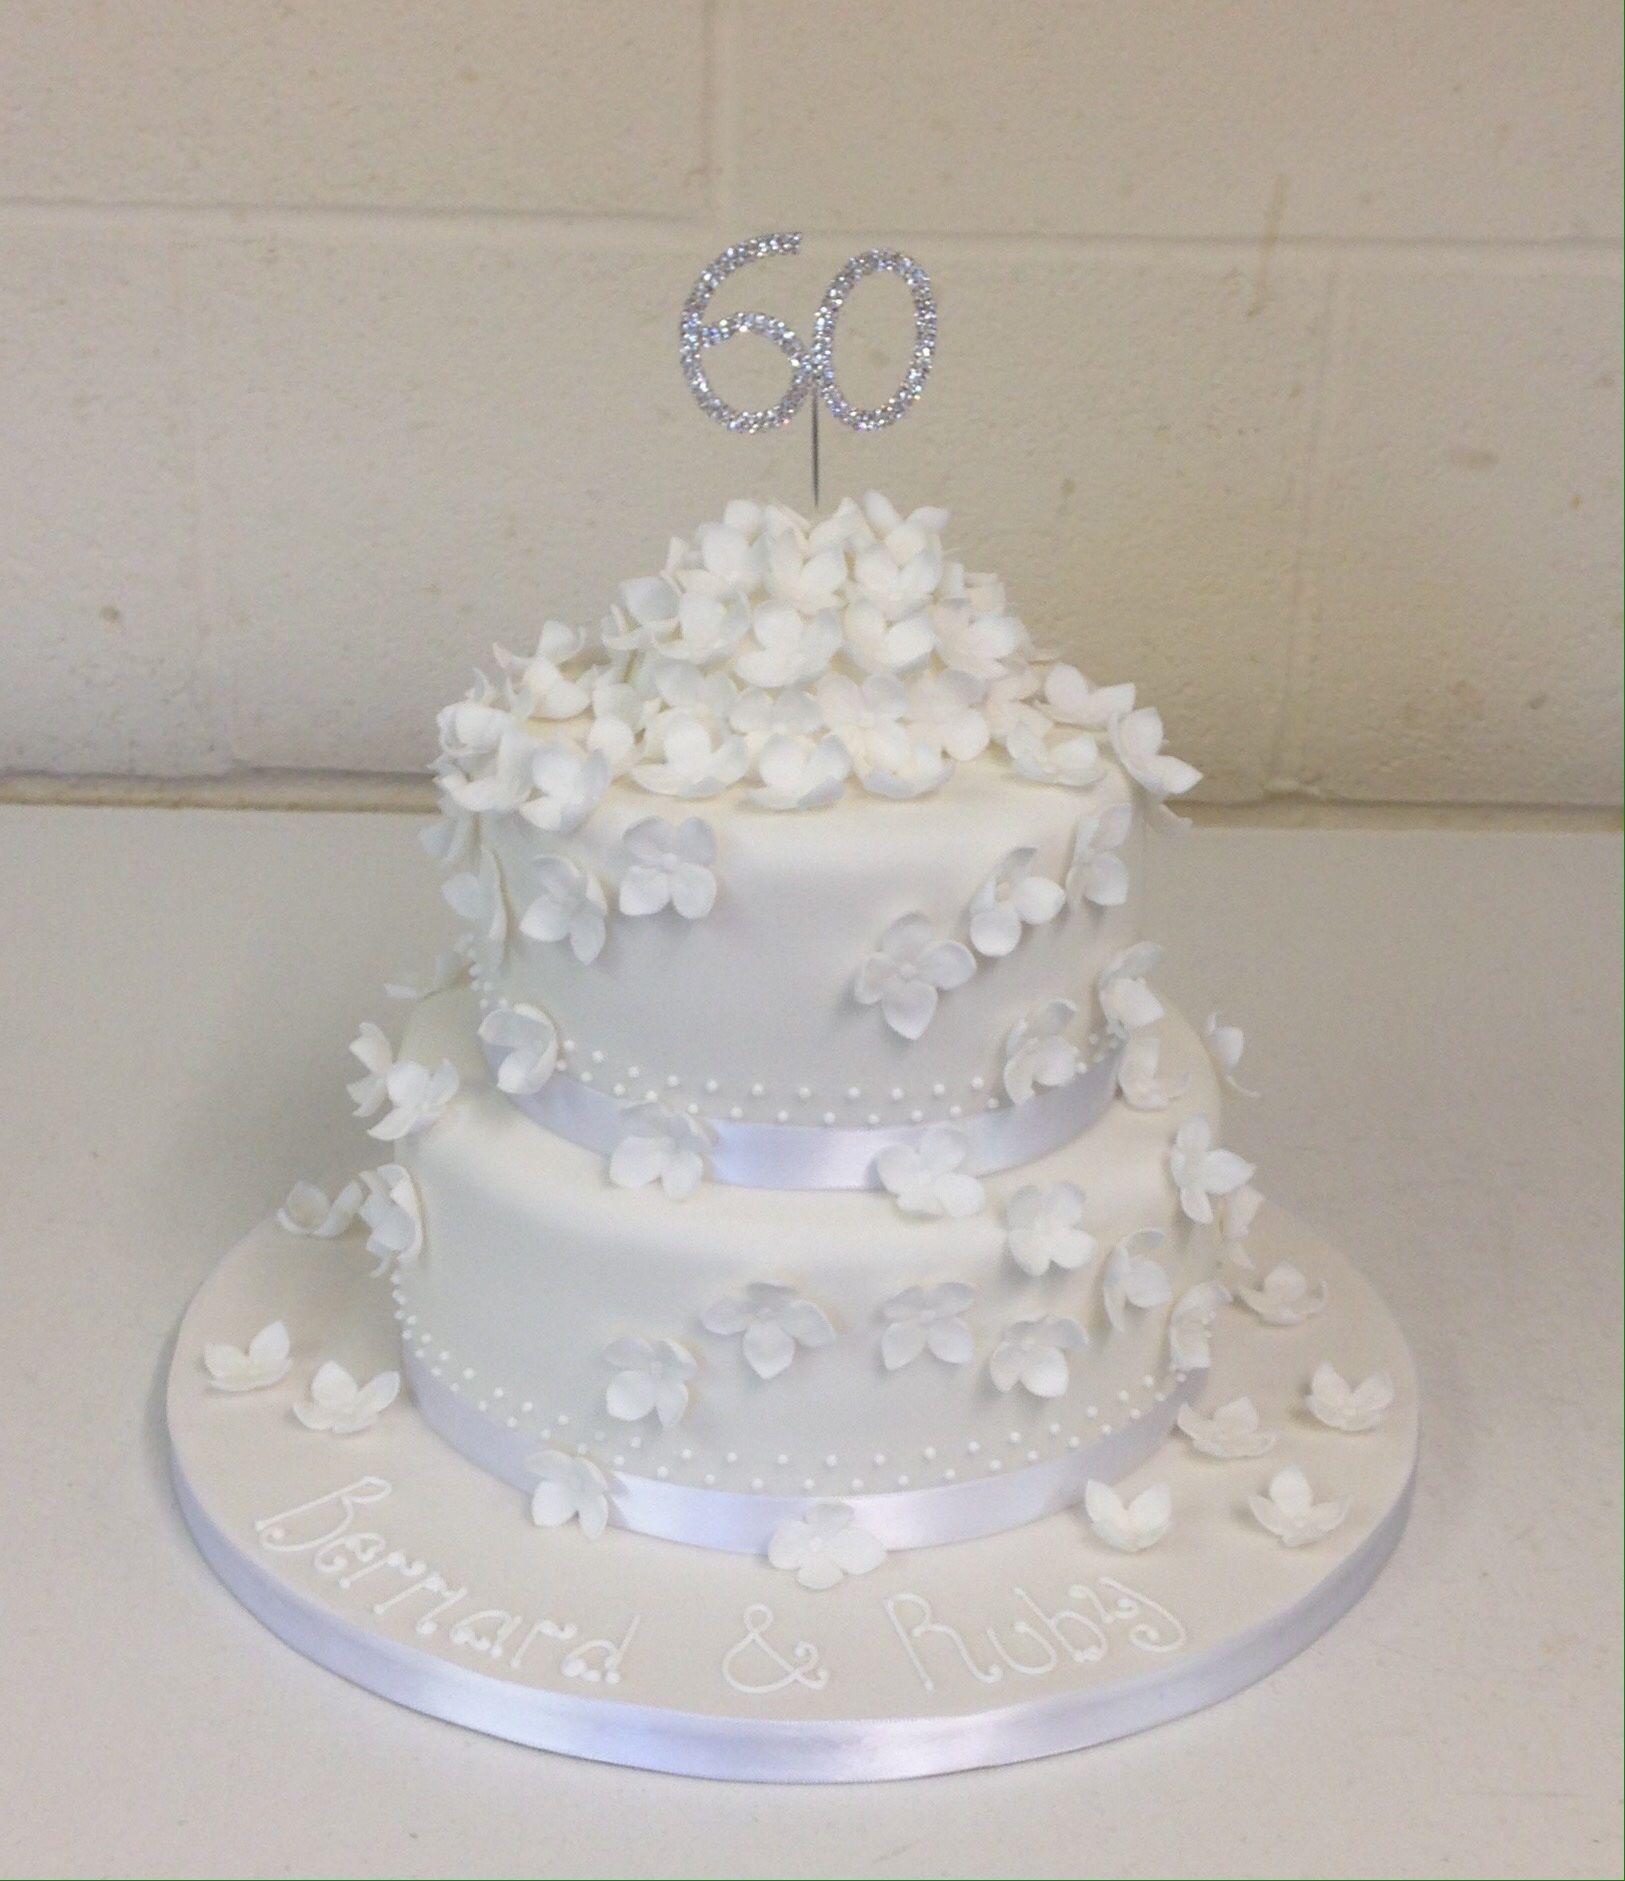 Diamond anniversary cake | Cake | Pinterest | Cake, Celebration ...